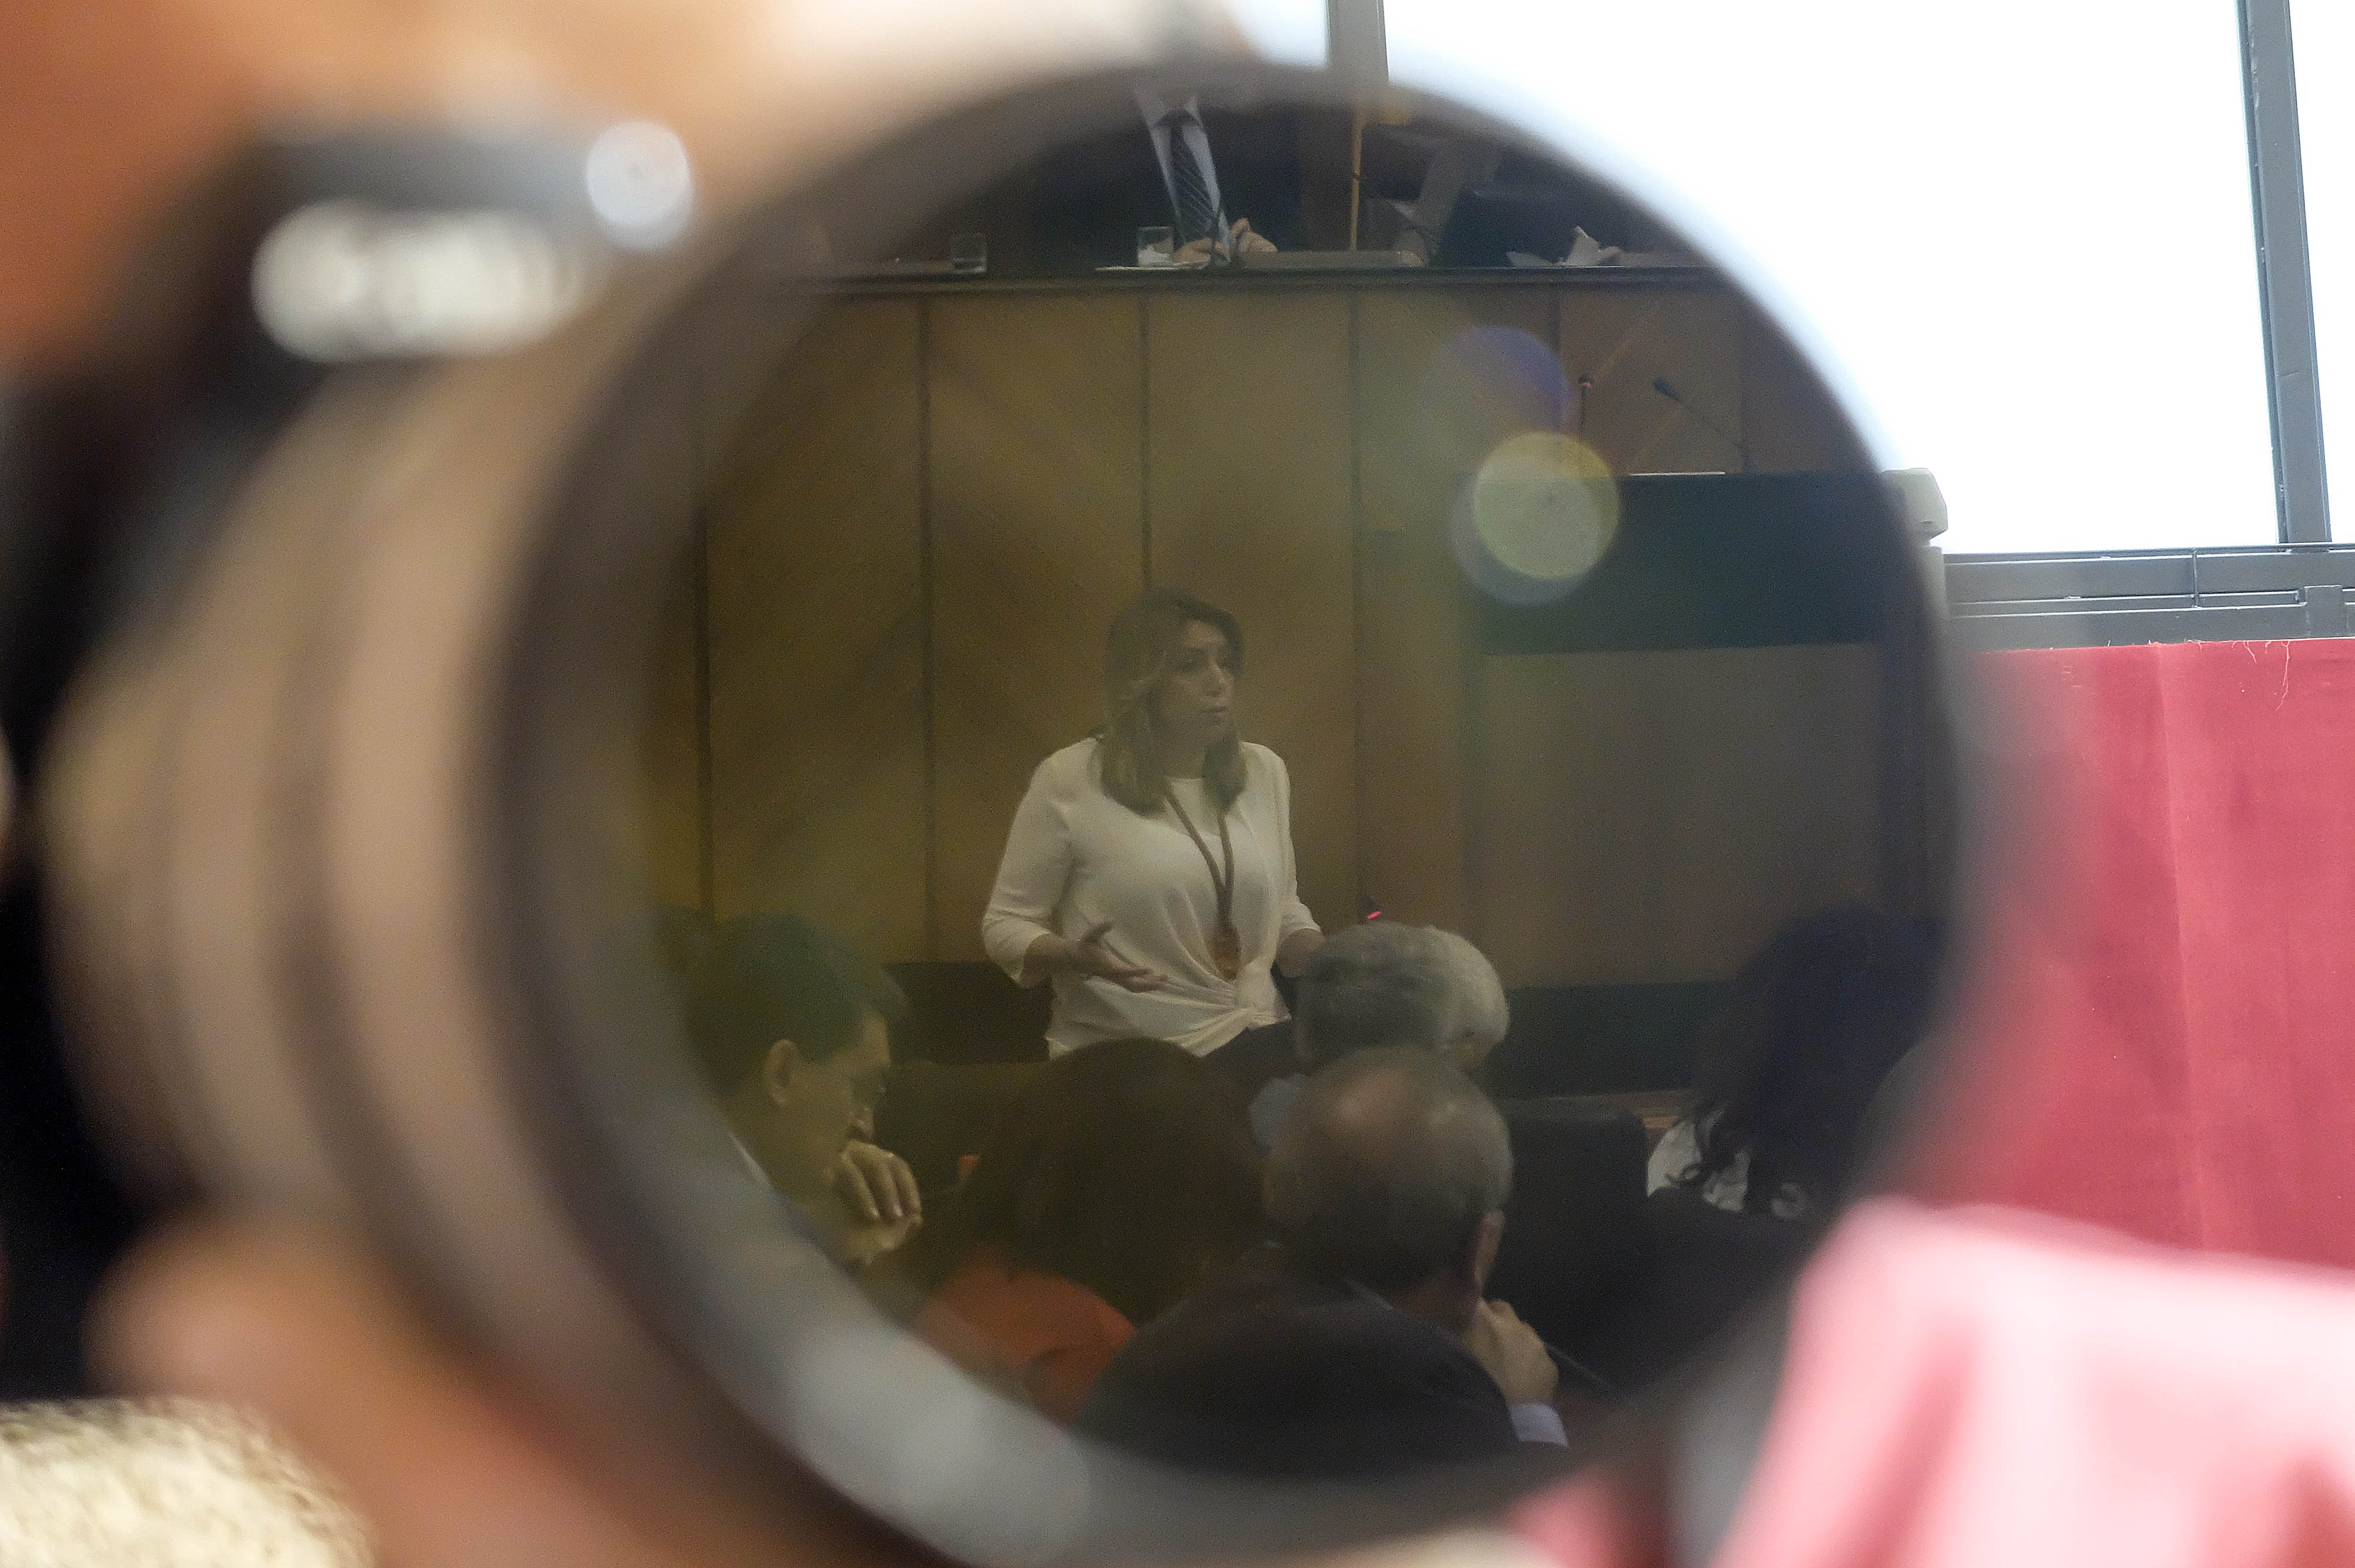 MO Parlamento, preguntas a la presidenta Susana Diaz 078